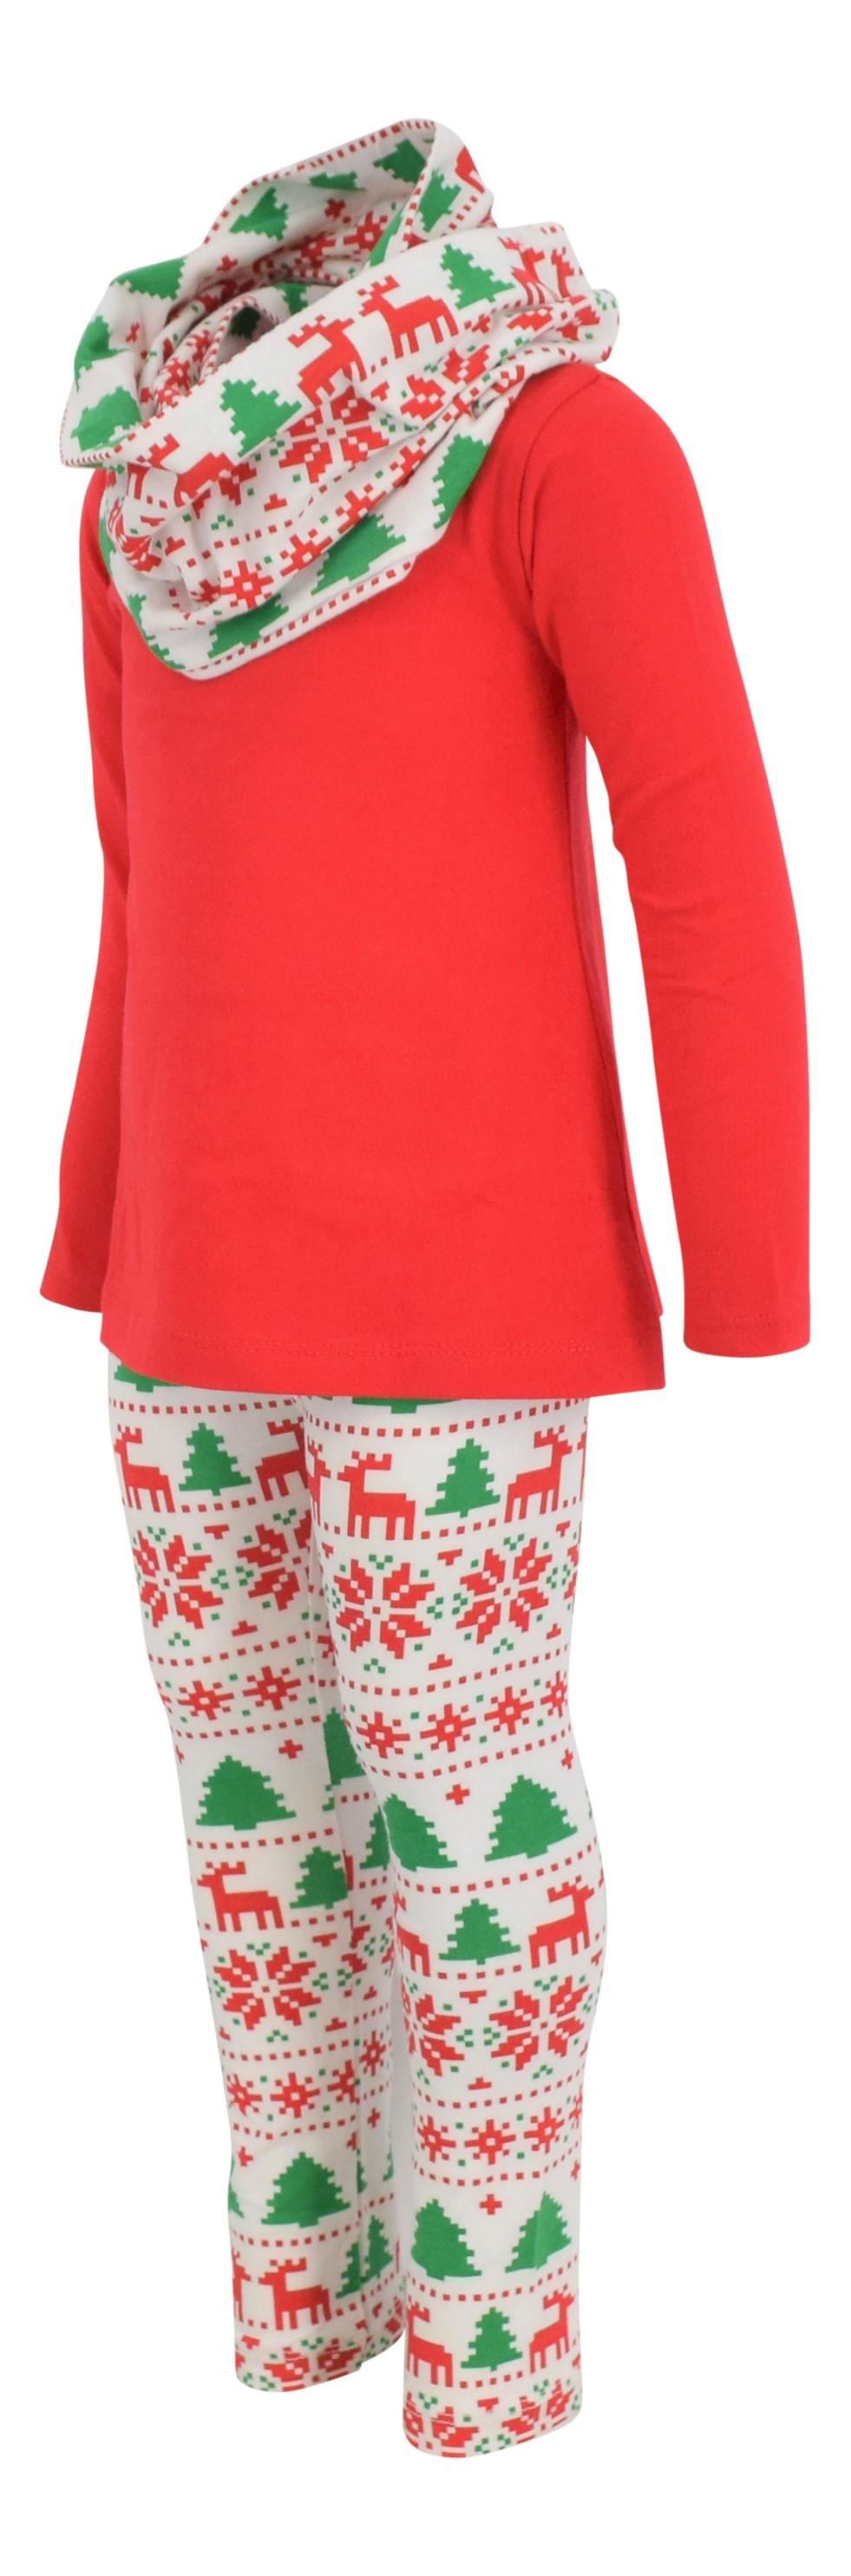 Girls 3 Piece Spring Winter Fox Legging Set  Boutique Outfit 2T 3t 4t 5 6 7 8